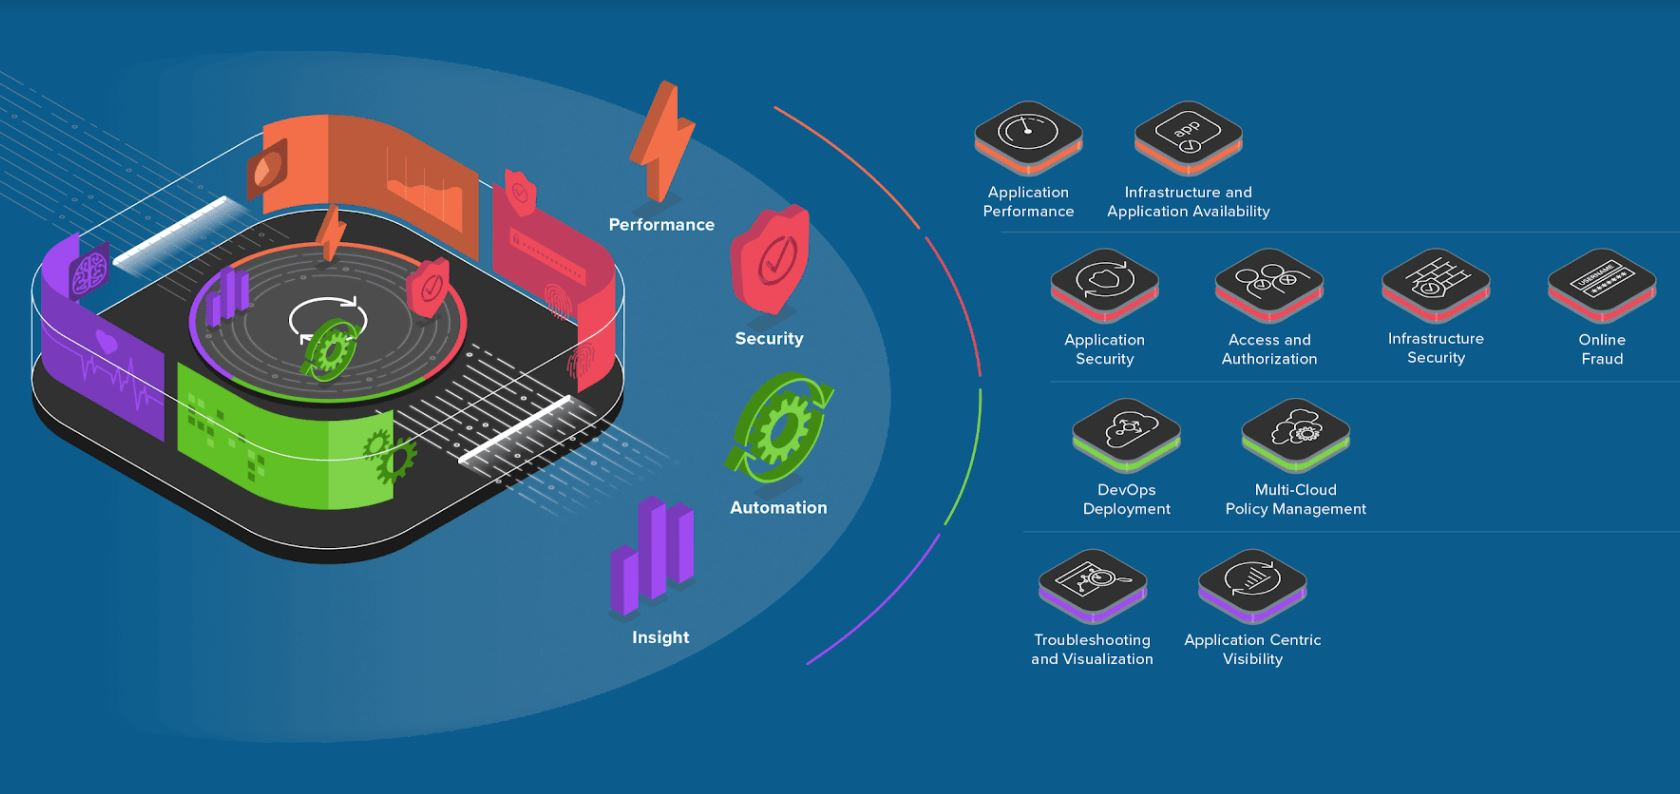 F5 Hadirkan Aplikasi Adaptif yang Aman dan Berikan Pengalaman Digital Terbaik untuk Organisasi